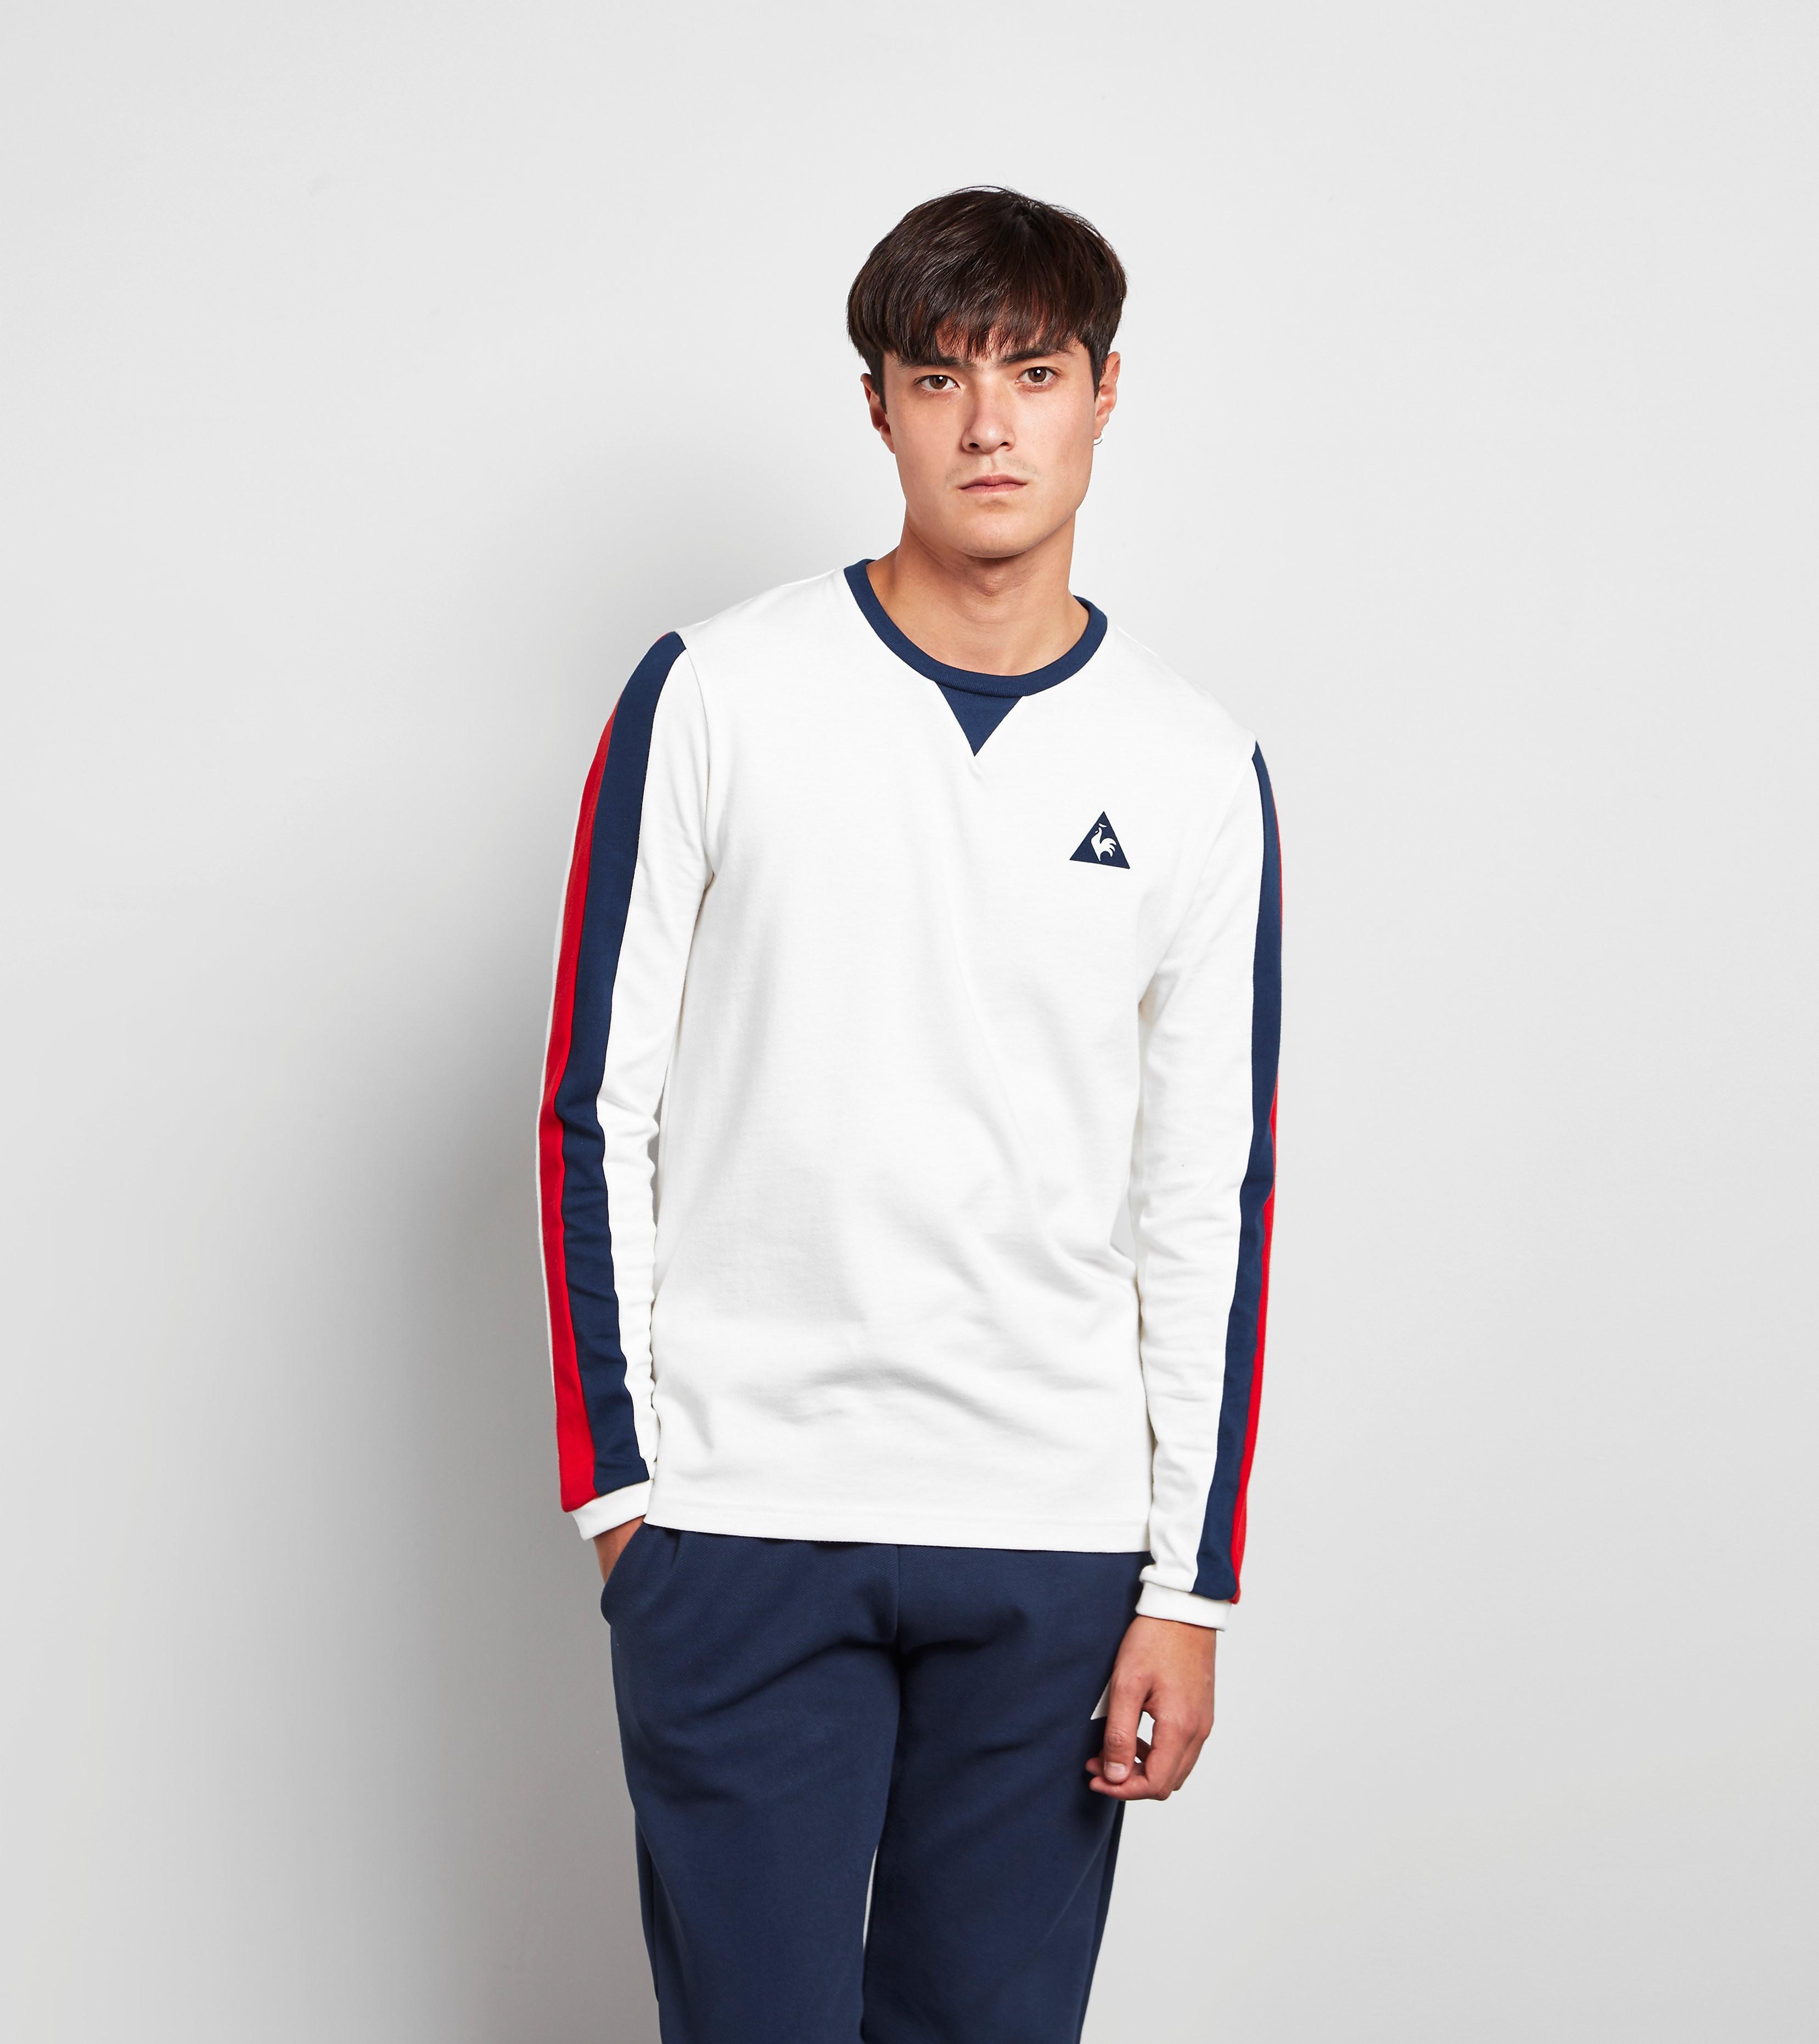 Le Coq Sportif Long-Sleeved Tricolore T-Shirt